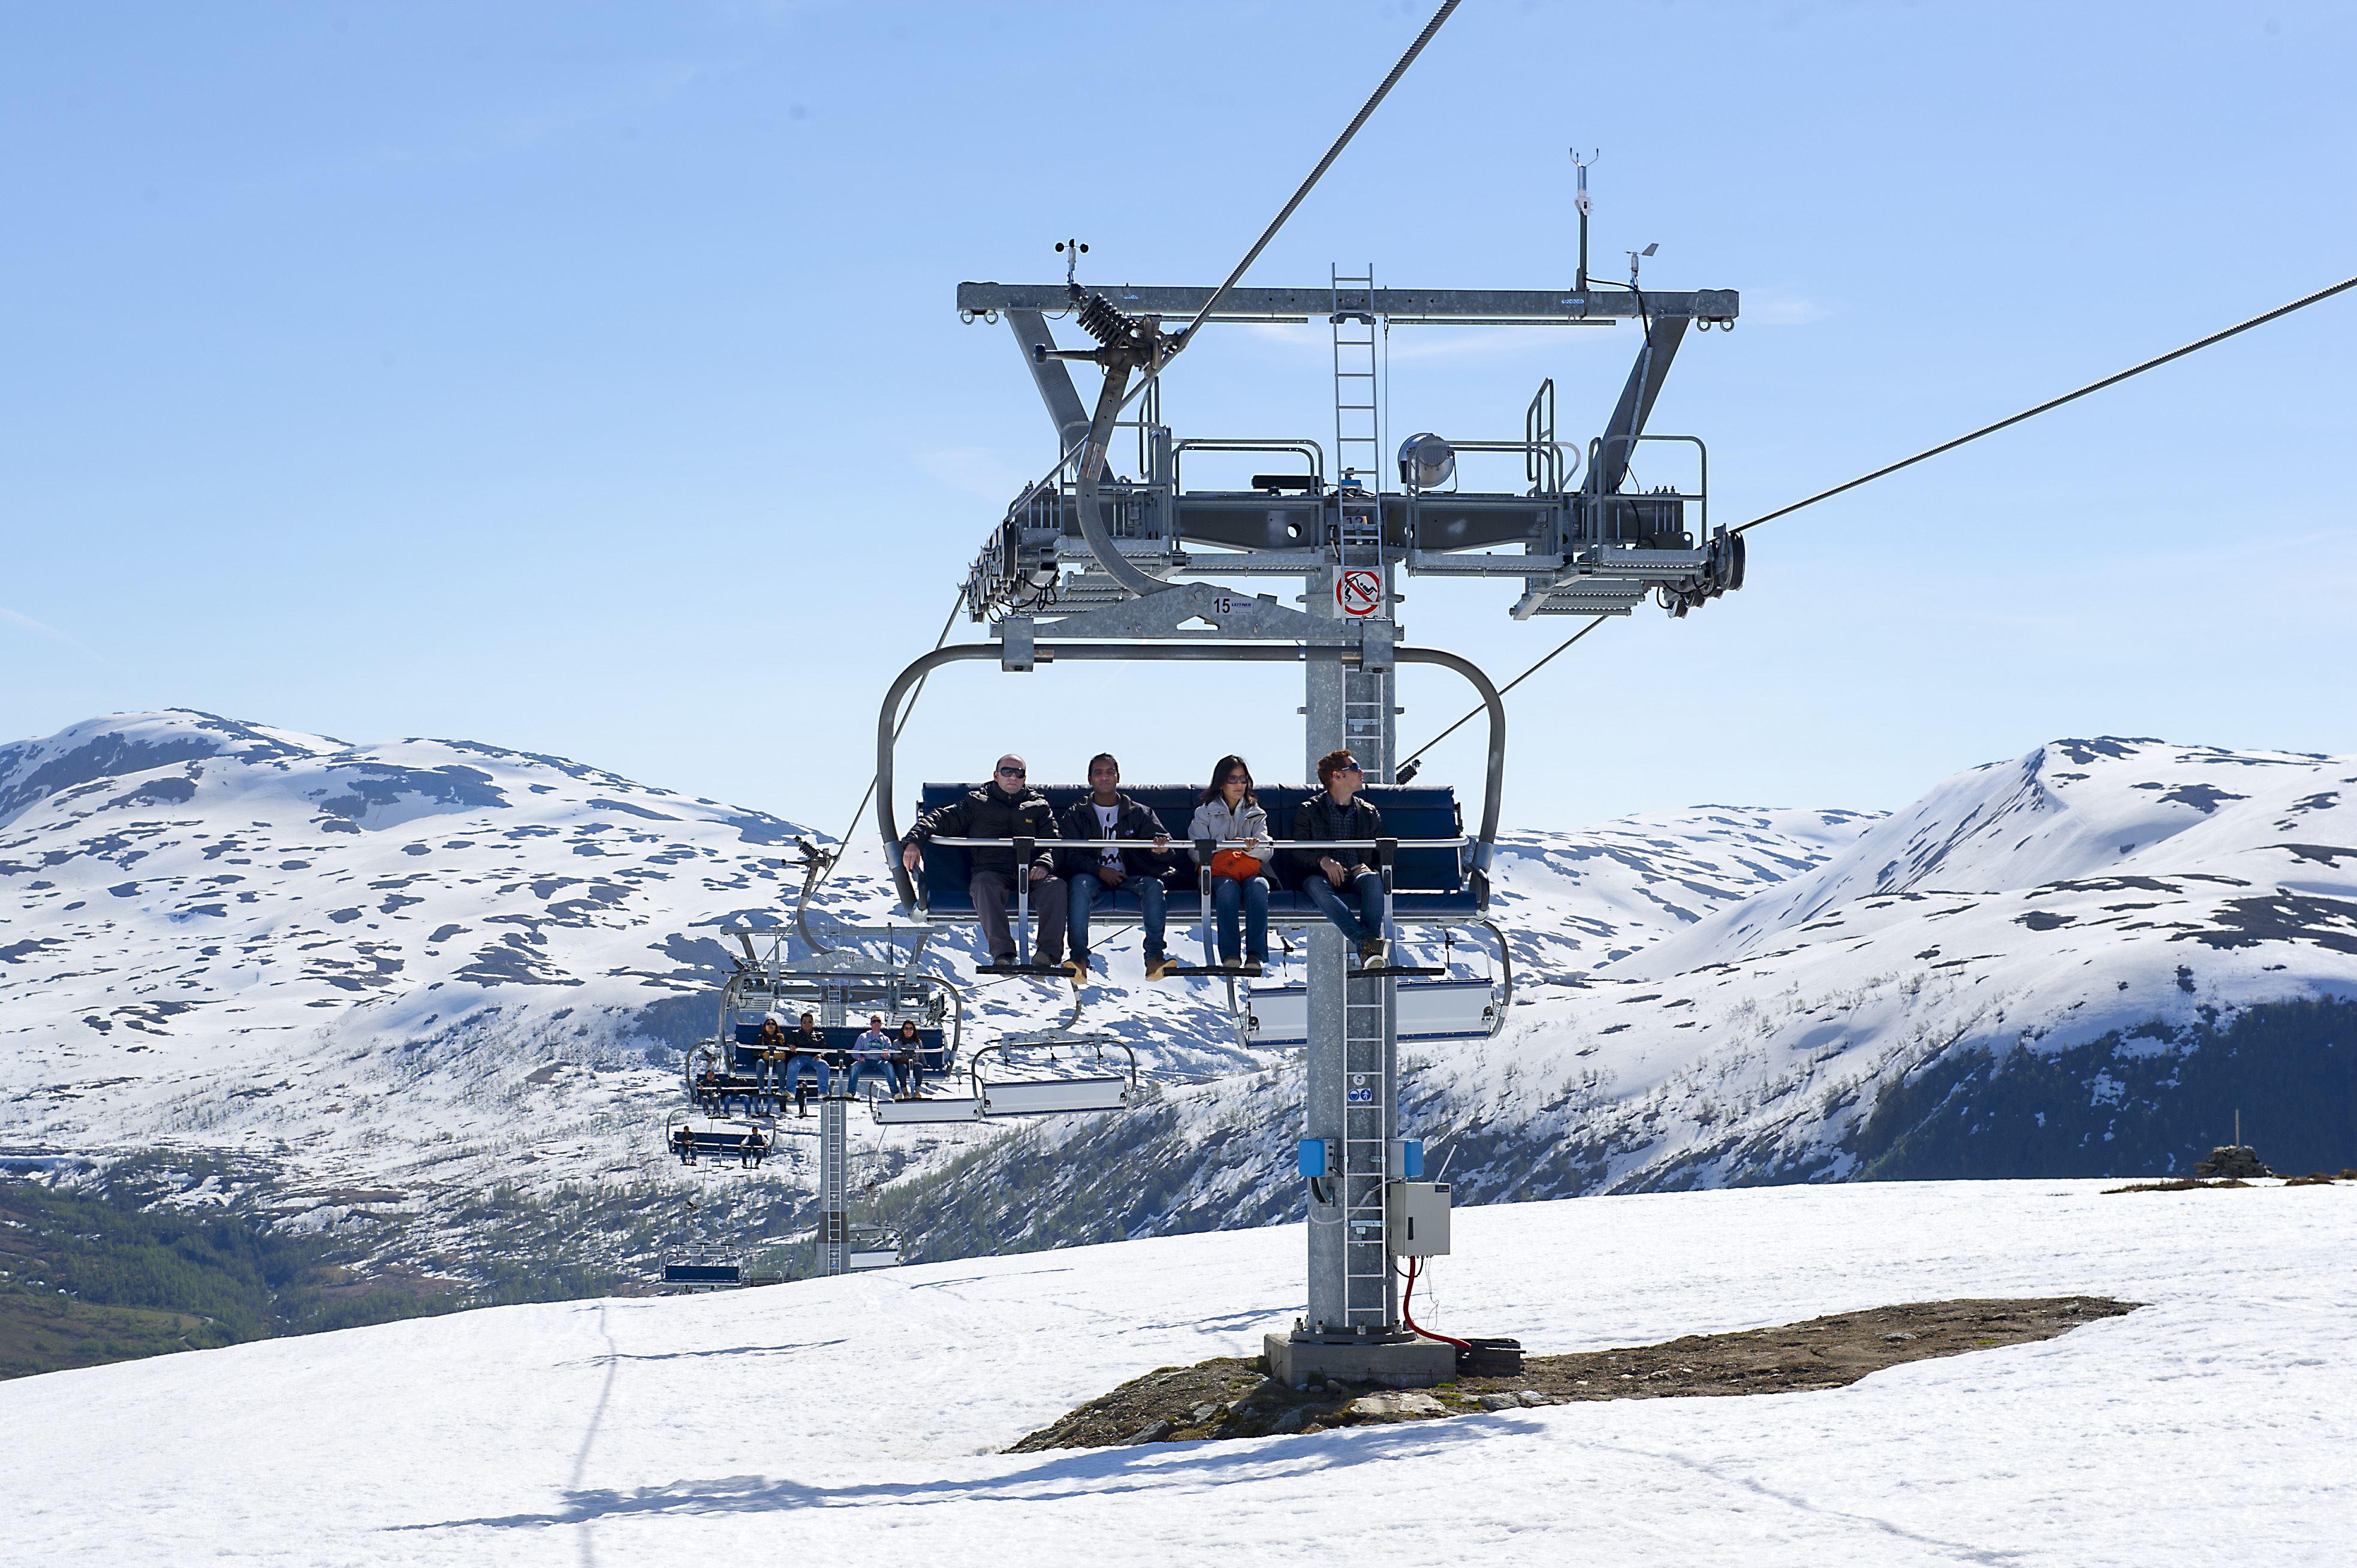 Frøydis Ormåsen, Snø Ekspress Flåm - Myrkdalen